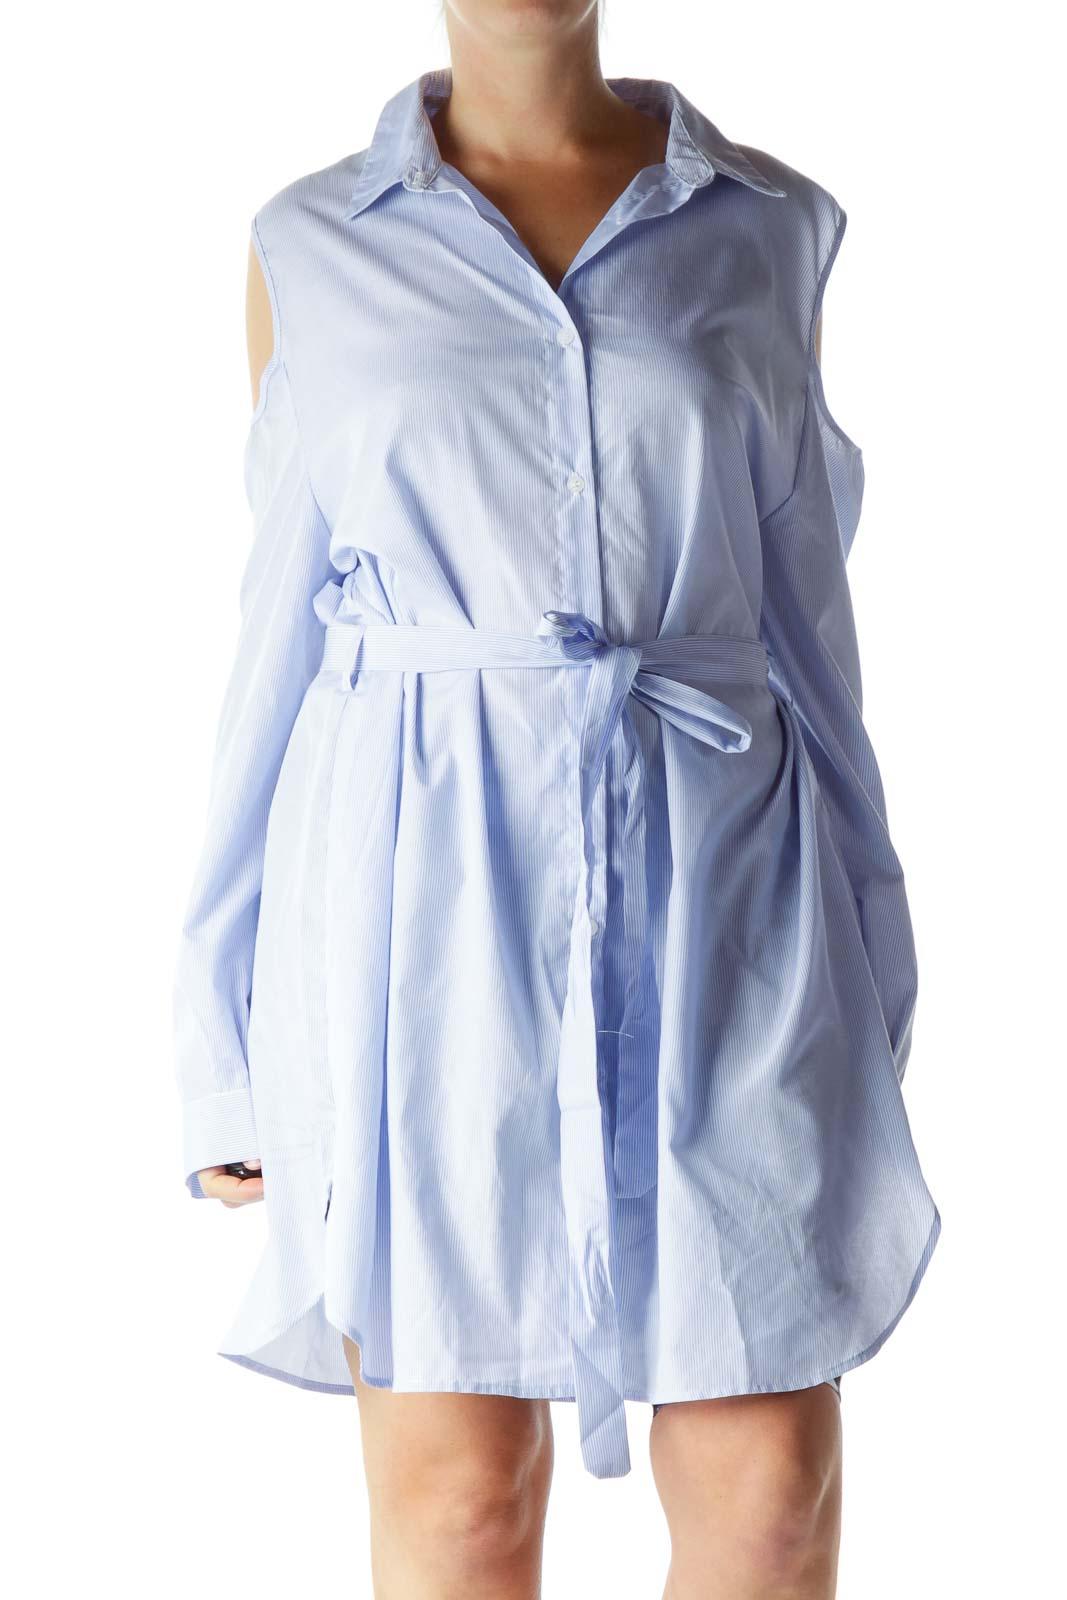 Blue White Pinstripe Off-Shoulder Day Dress Front